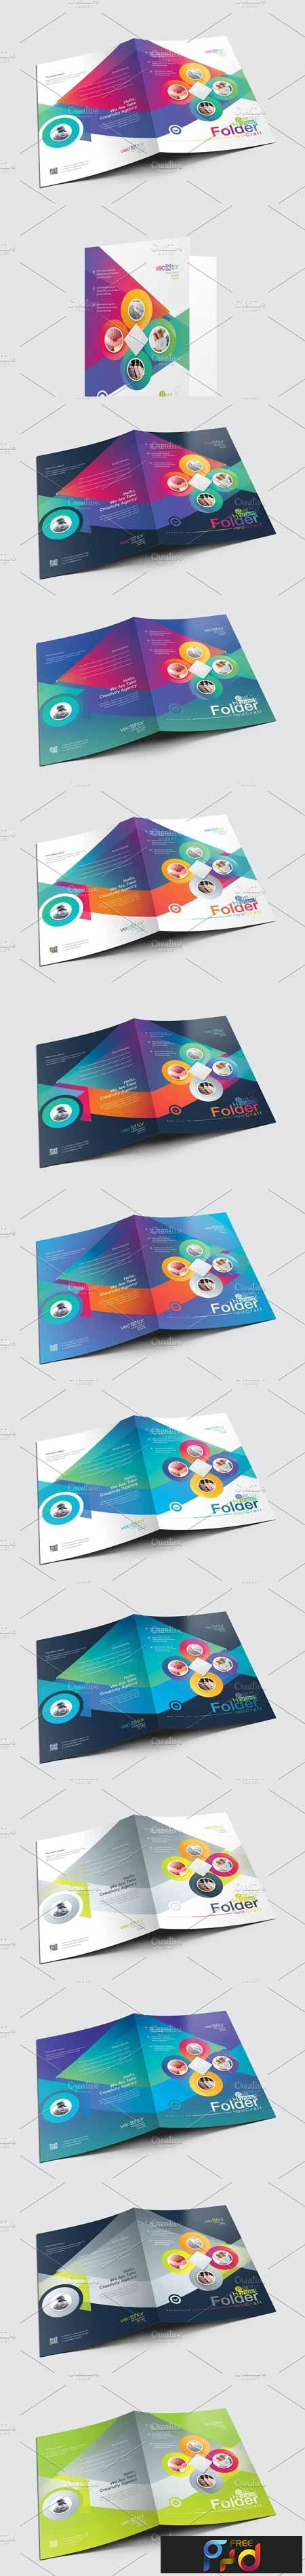 Presentation Folder 3068087 1